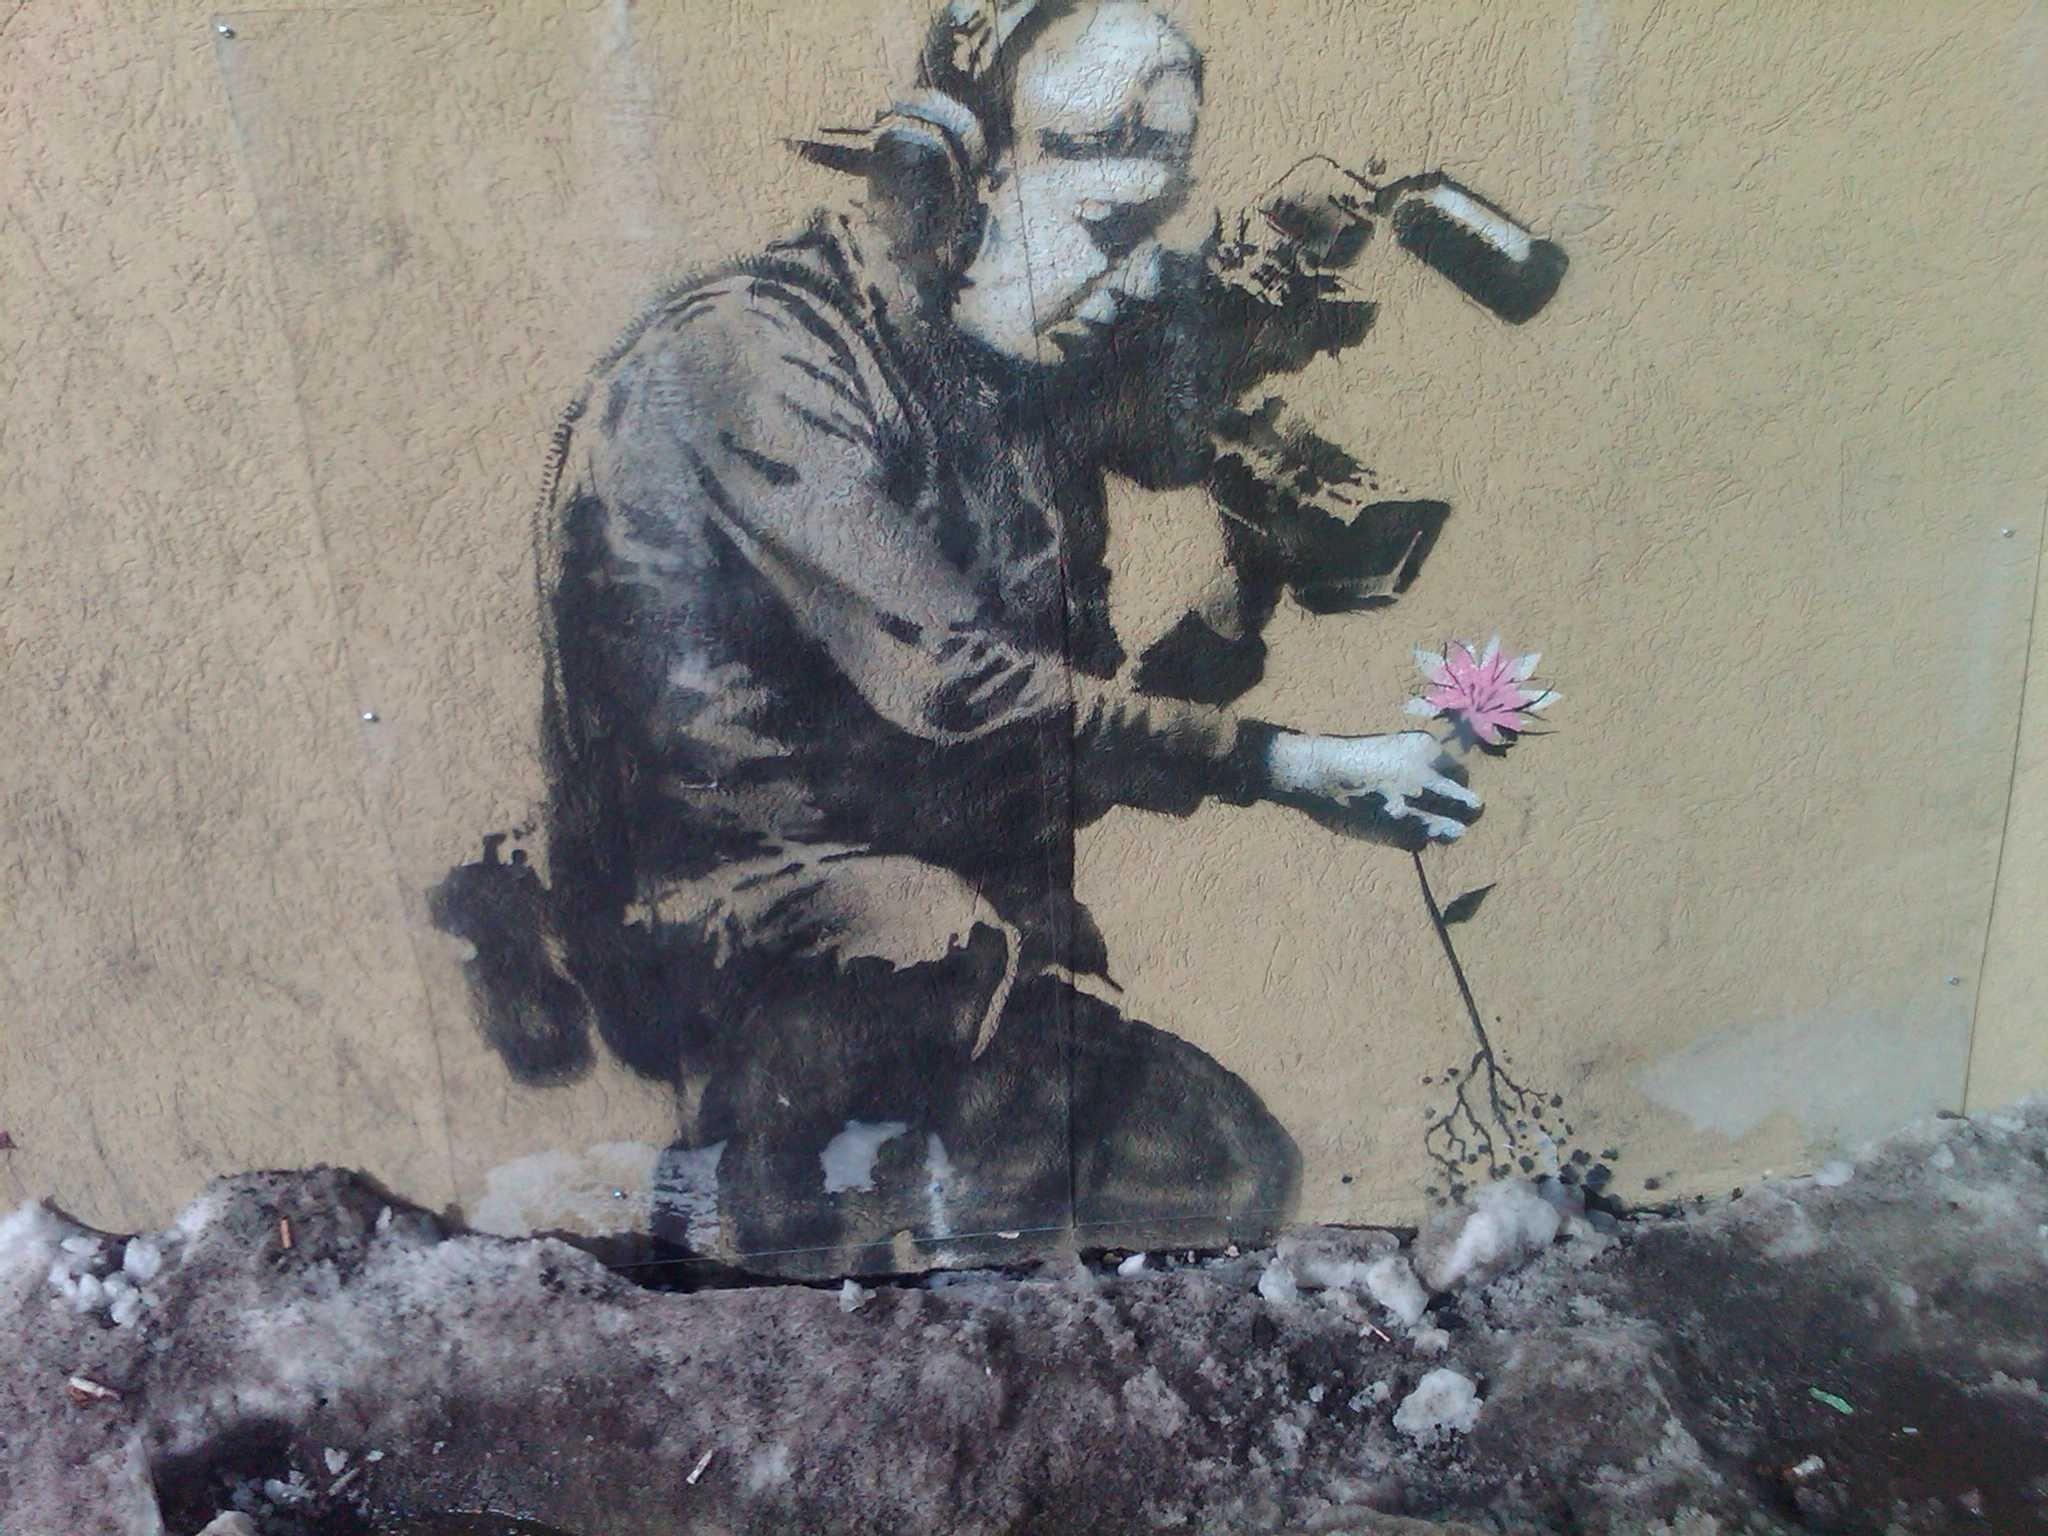 banksy wallpaper hd 77 images